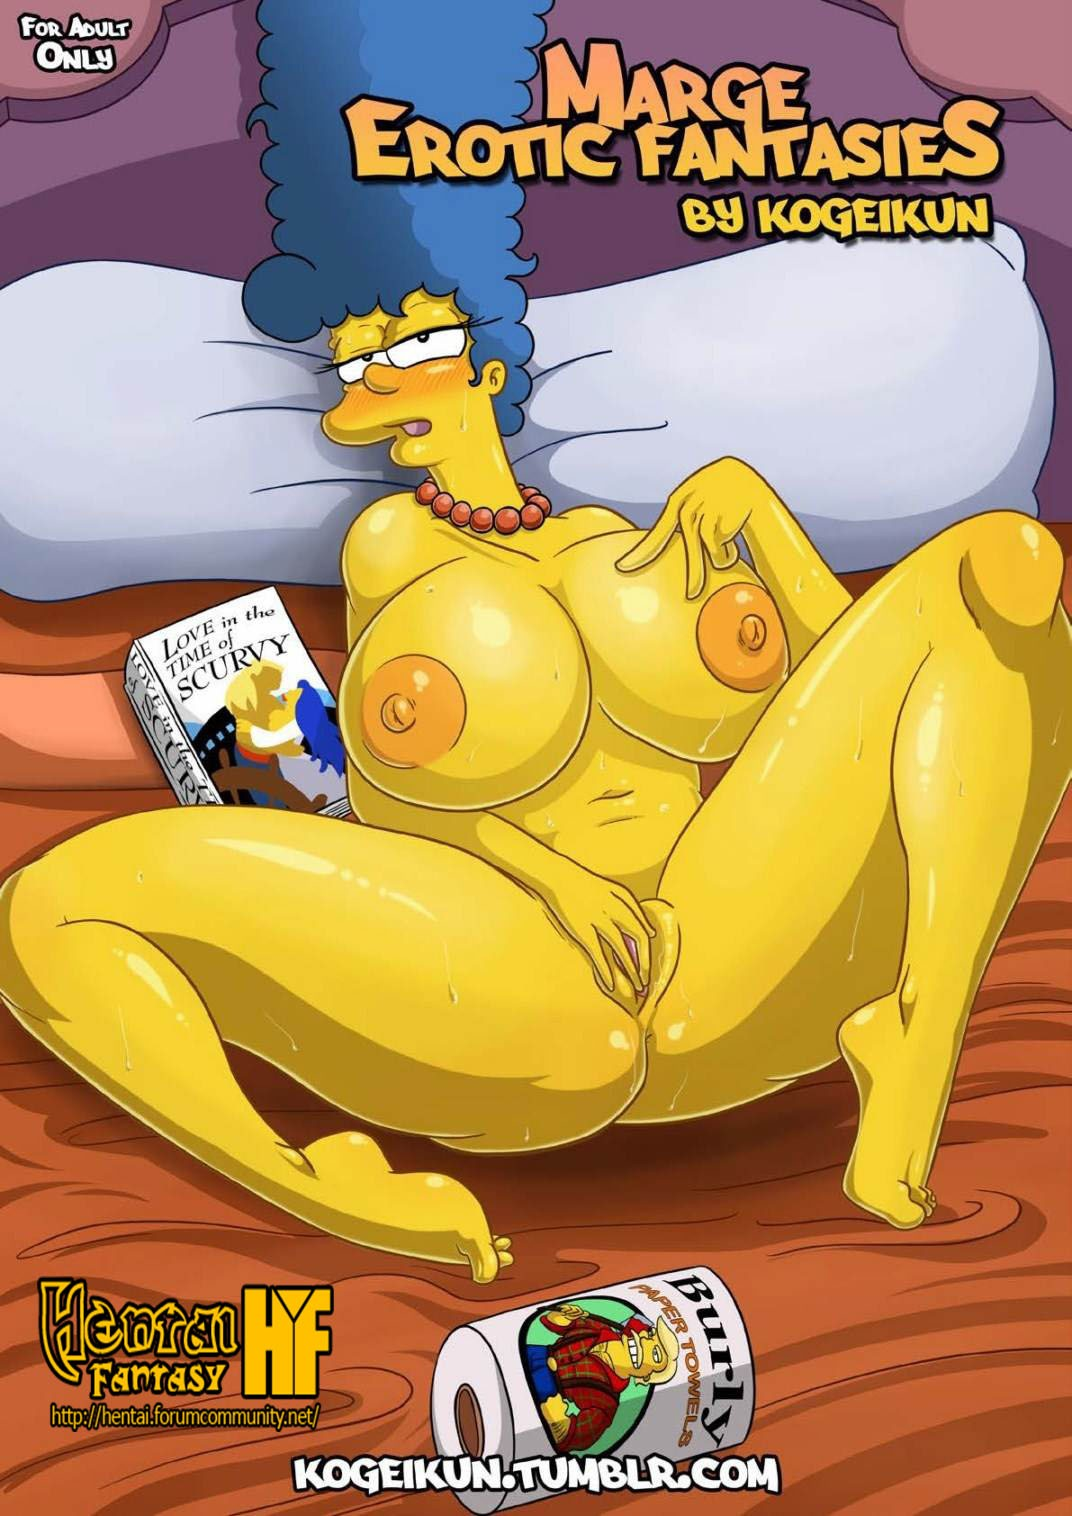 surefap.org__Le-Fantasie-Erotiche-Di-Marge-ITA-00-Cover__Gotofap.tk__3129820920_544306627.jpg